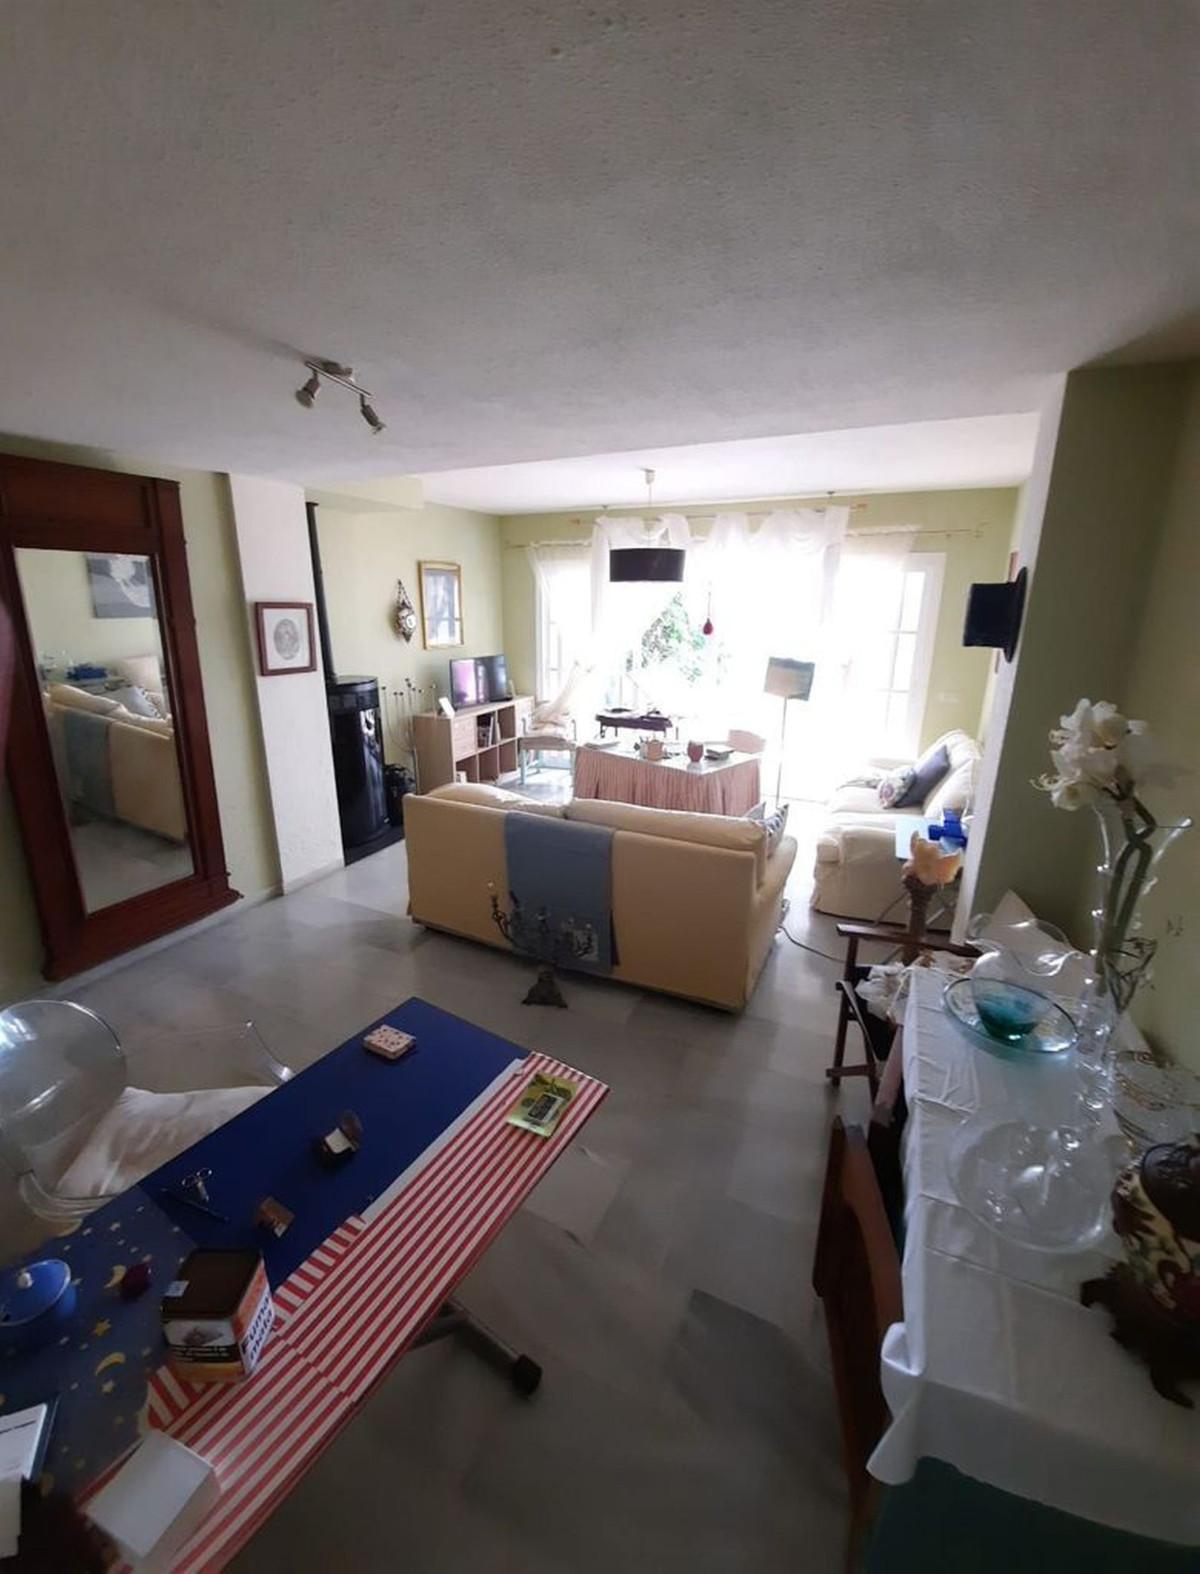 R3894595 | Semi-Detached House in Estepona – € 258,000 – 2 beds, 2 baths